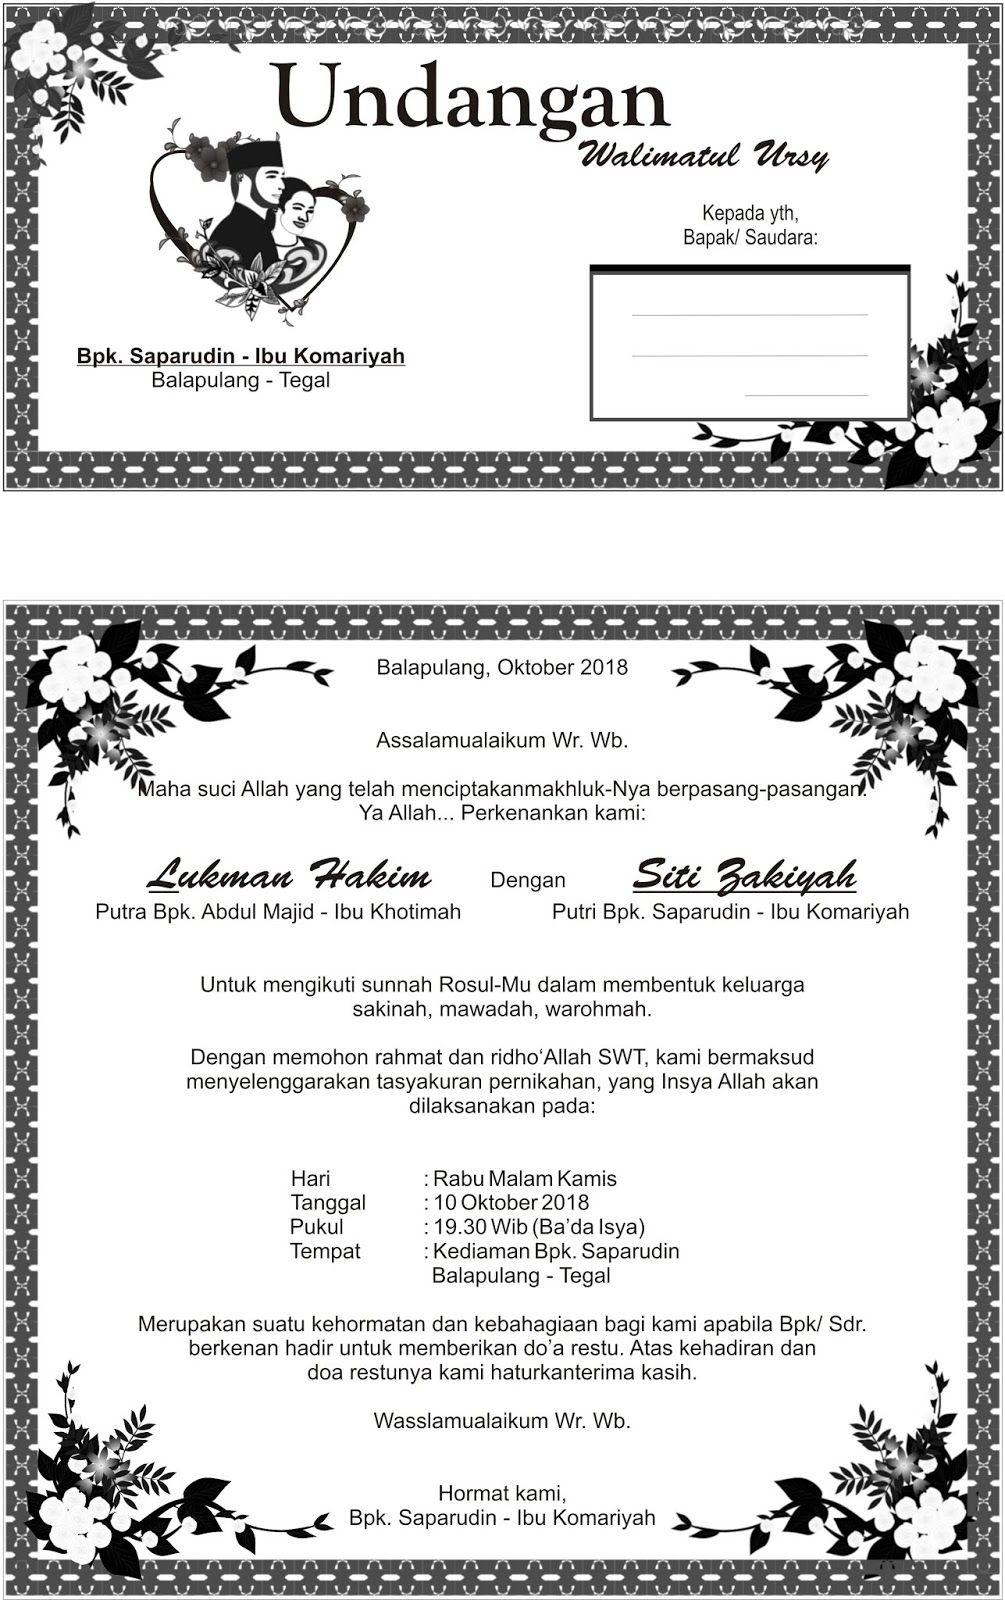 Undangan Walimatul Ursy Zakiyah | Undangan, Desain ...